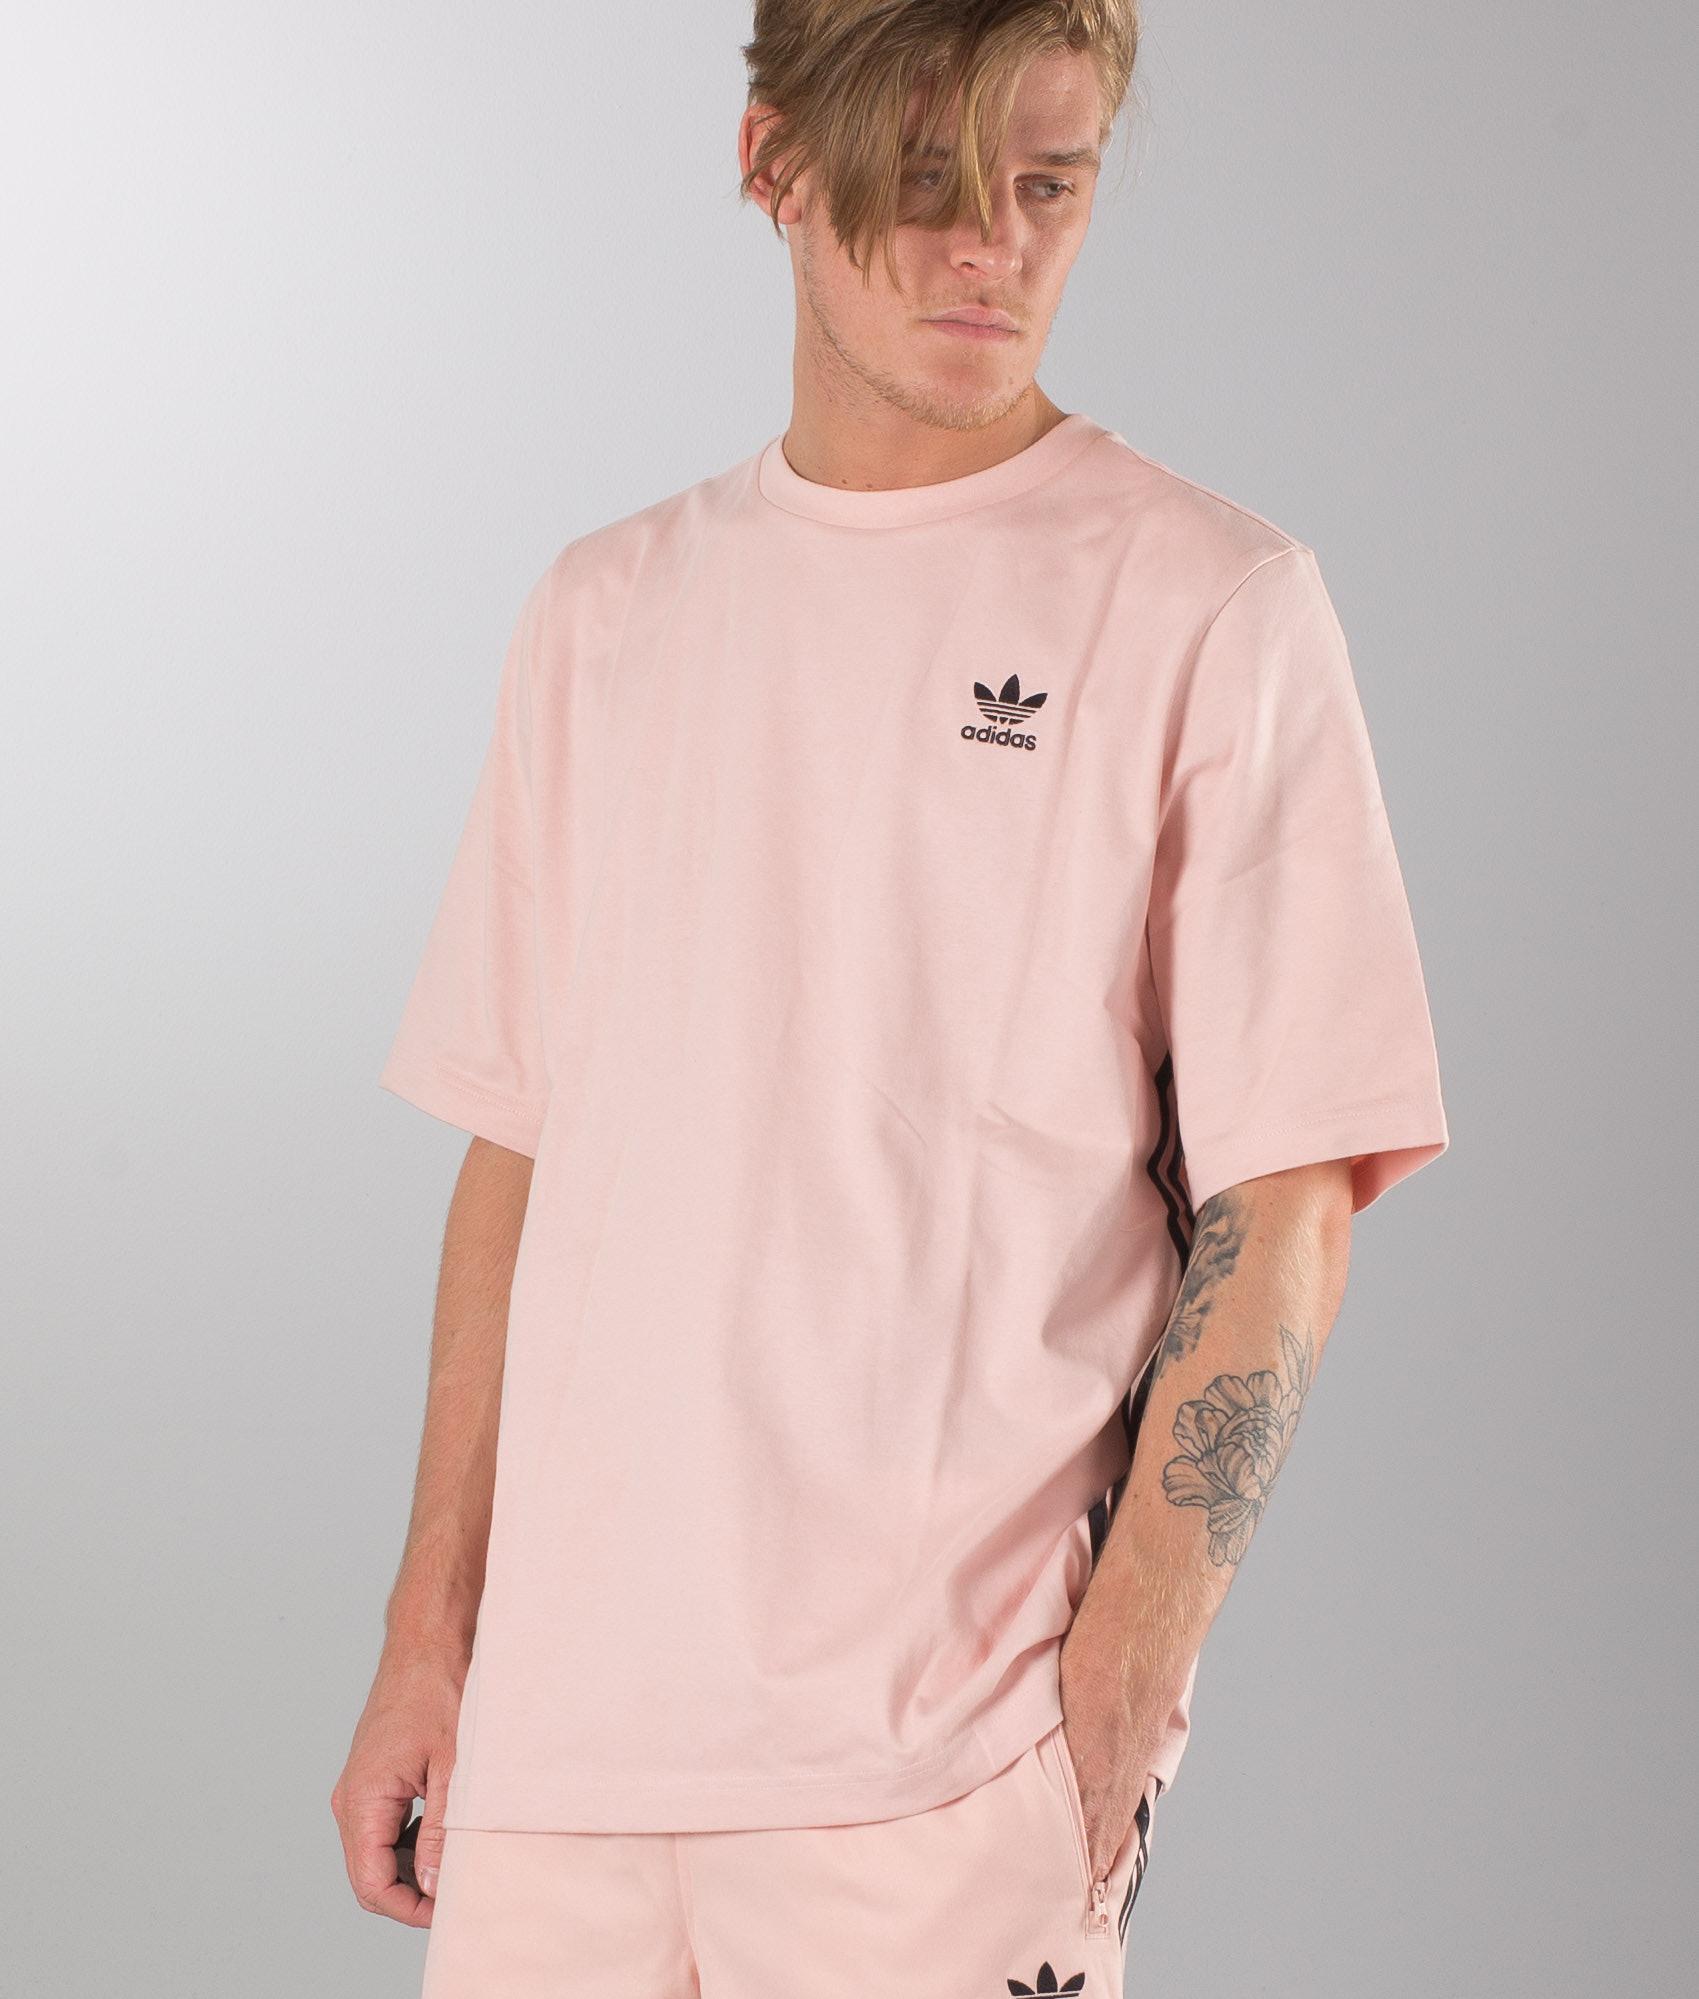 Adidas Originals OB Boxy T-shirt Pink